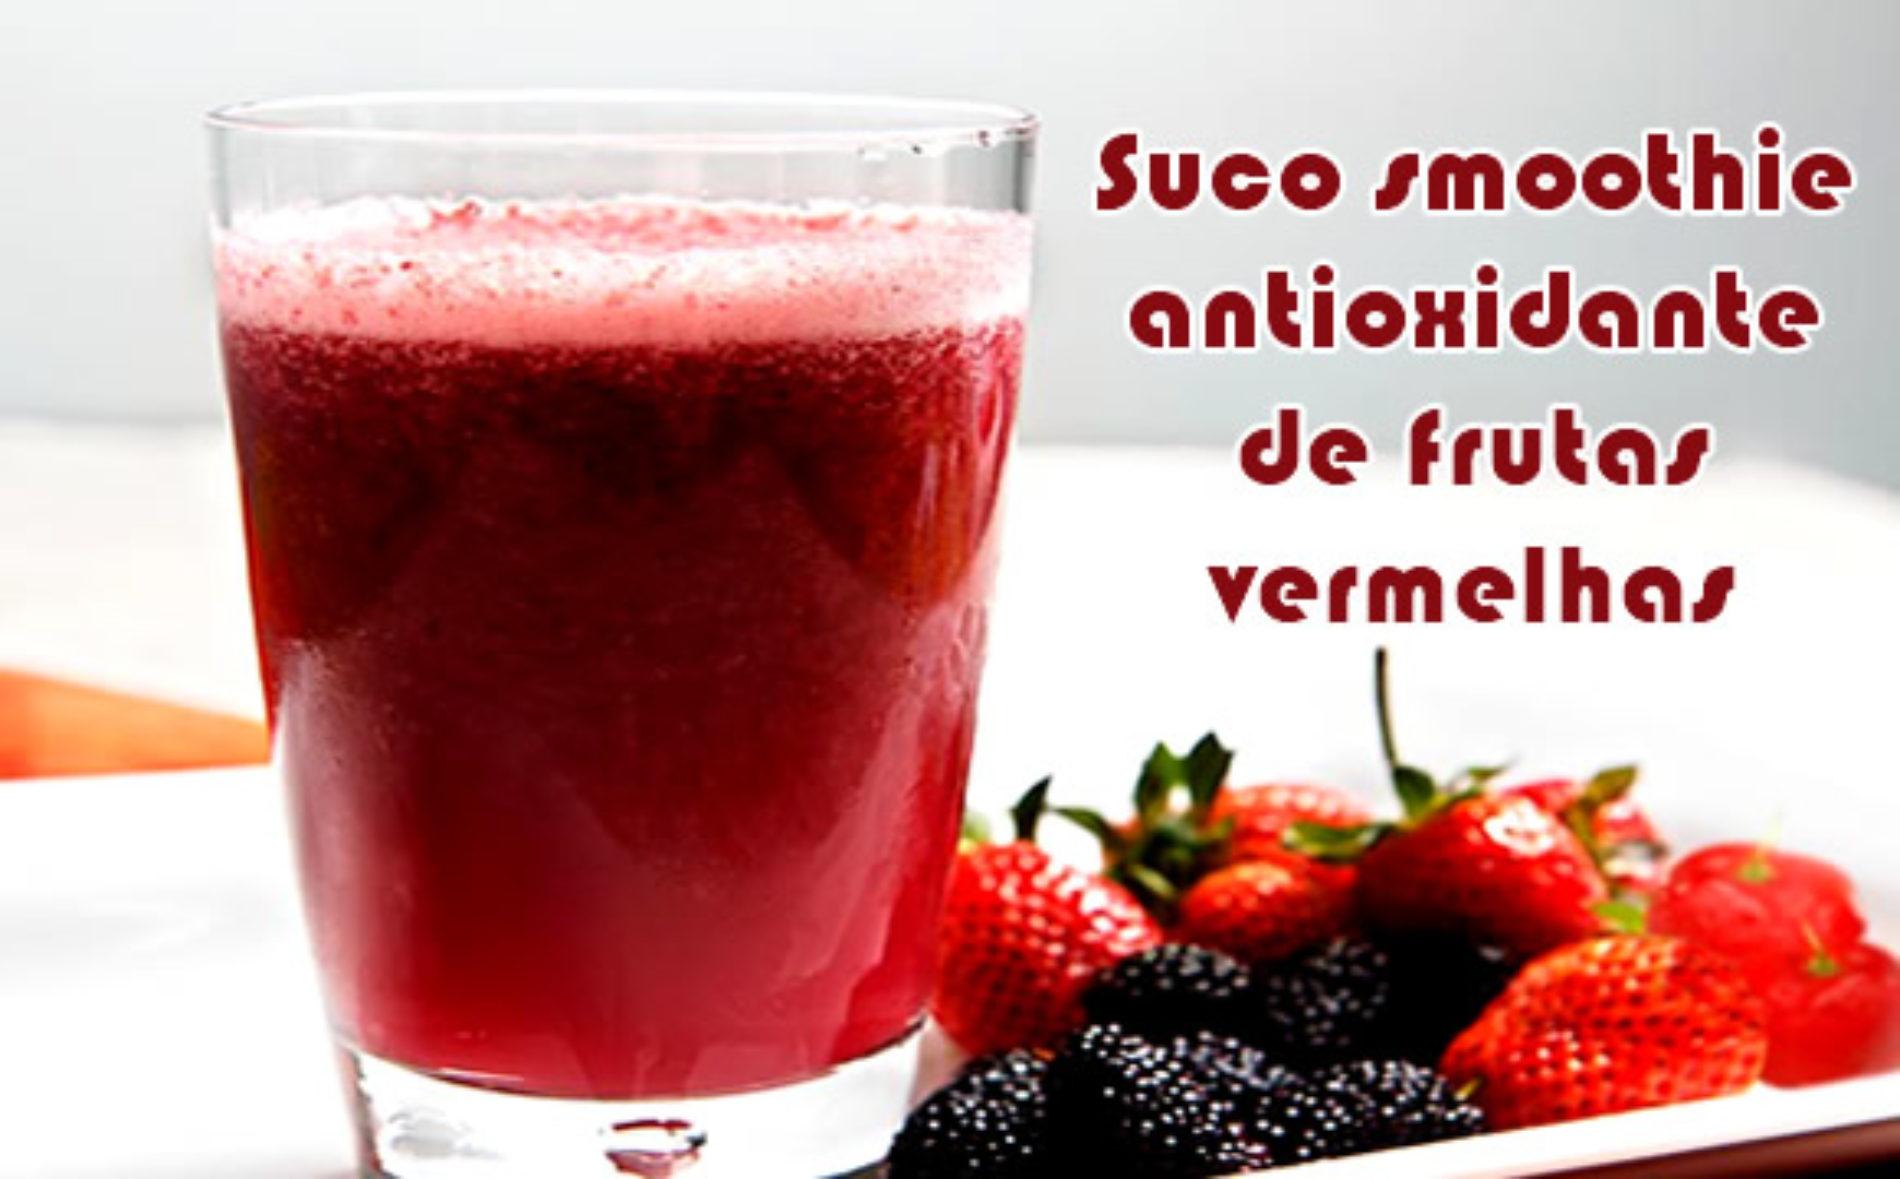 Suco smoothie antioxidante – Receitas fit